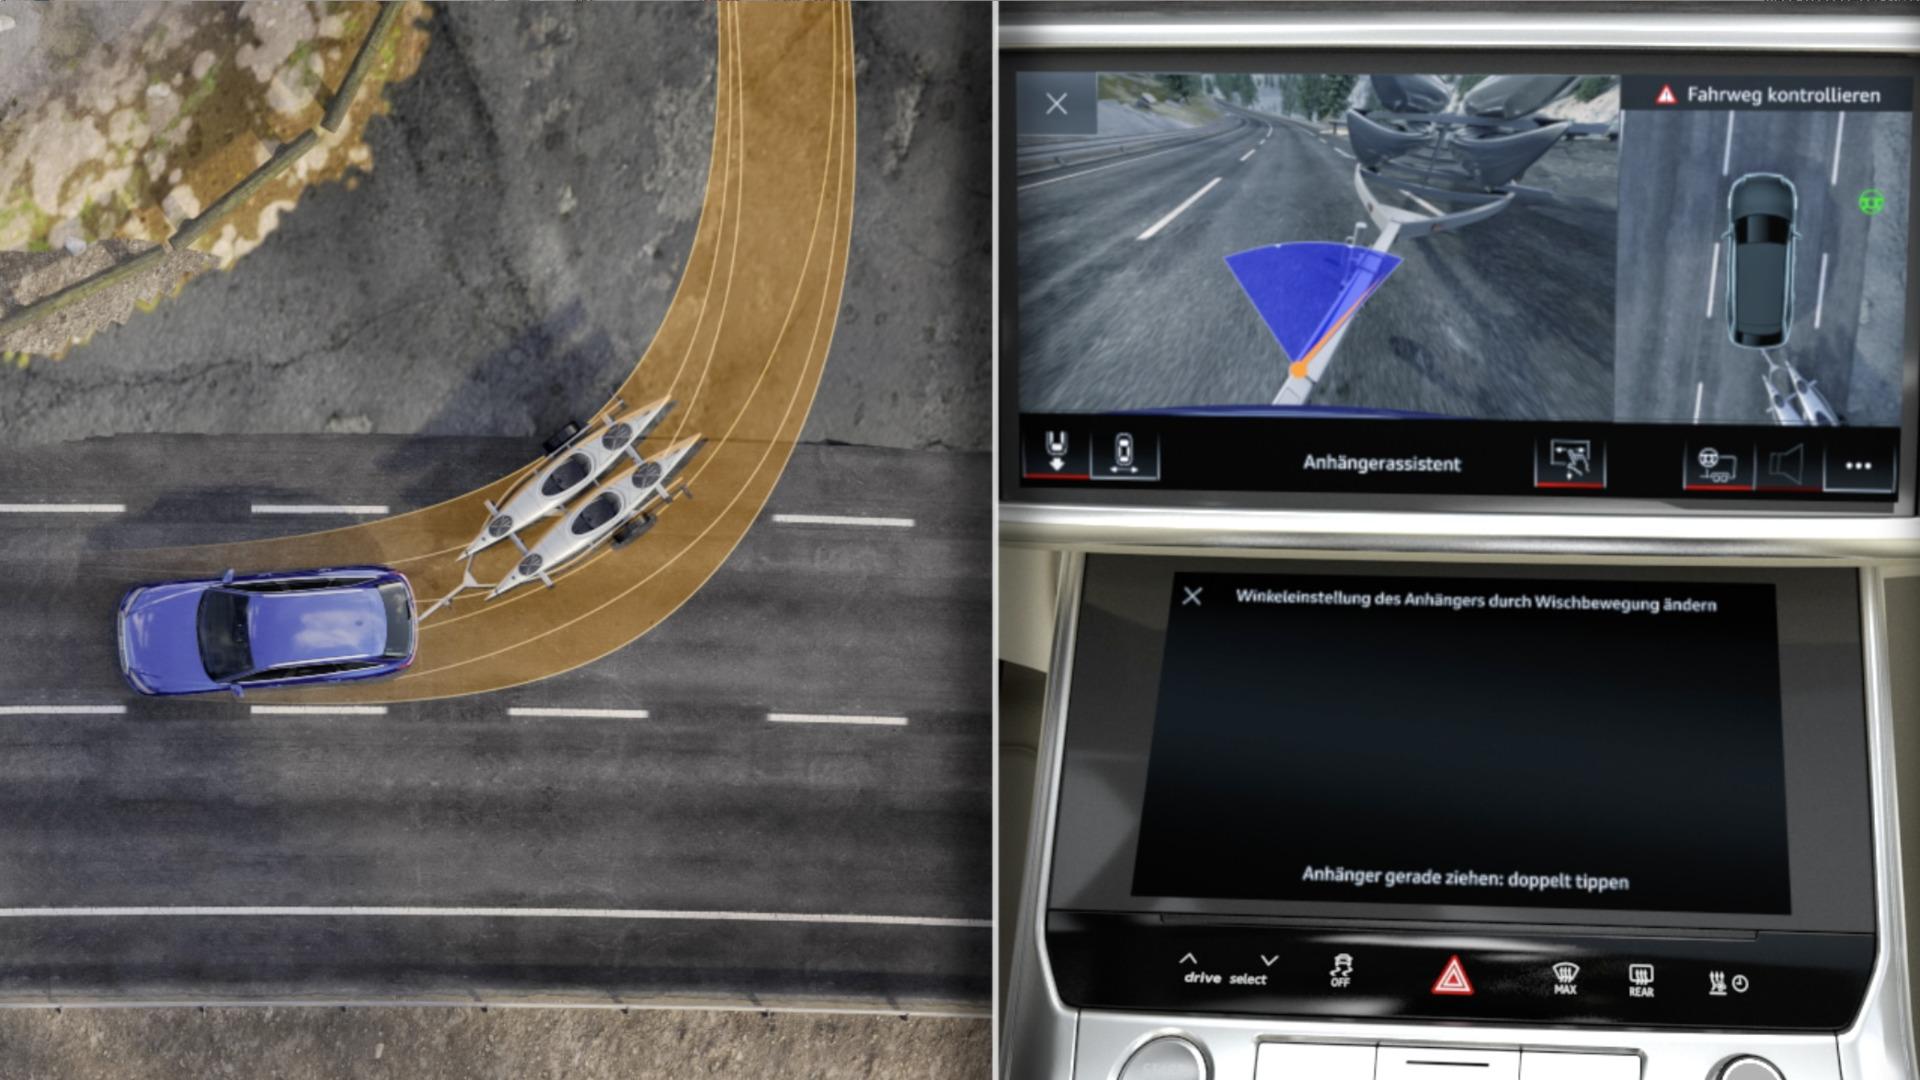 Audi A6 Avant Animation Anhängerassistent